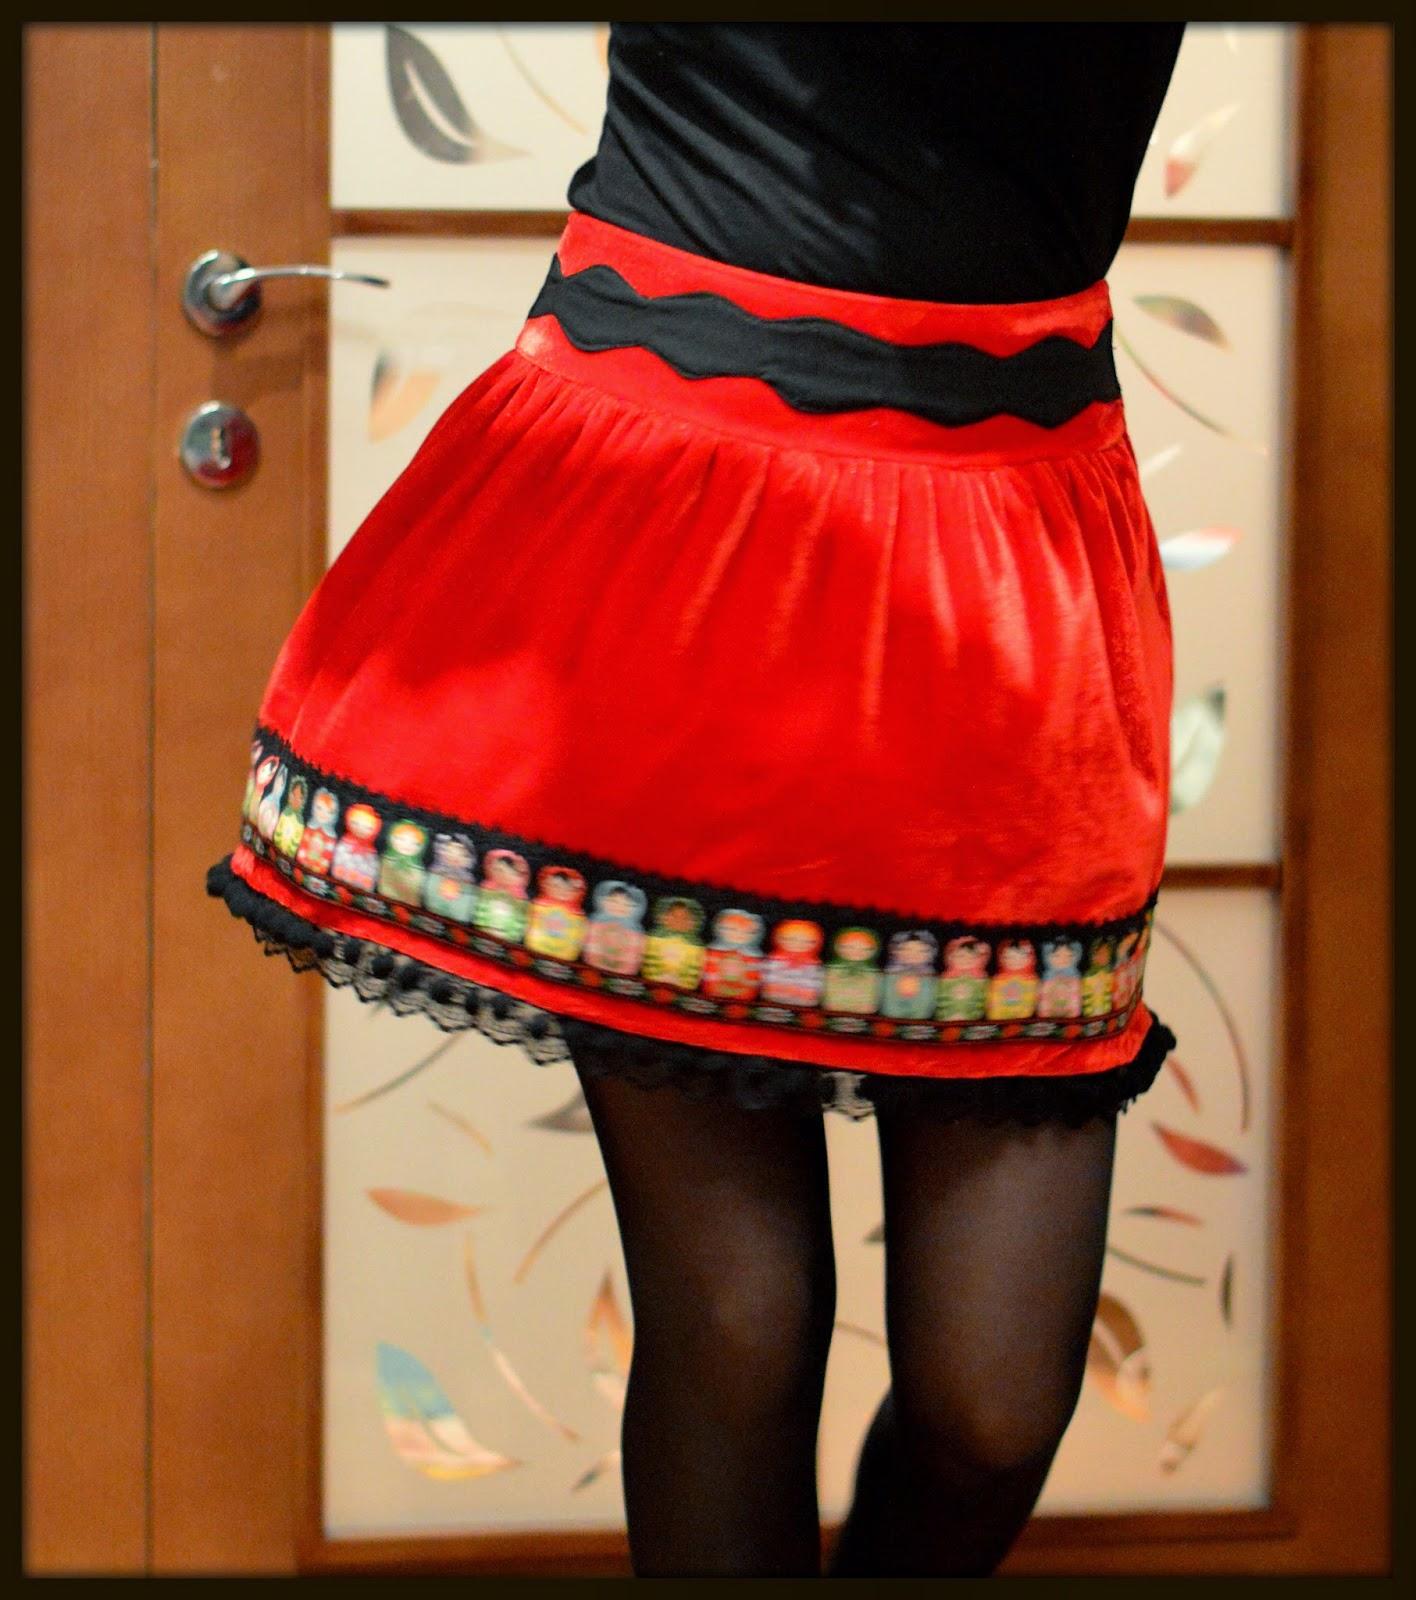 lace tape, matryoshka doll, pom poms tape, red velvet, ribbons applique, skirt, lace hem, decorated waistband, twirl